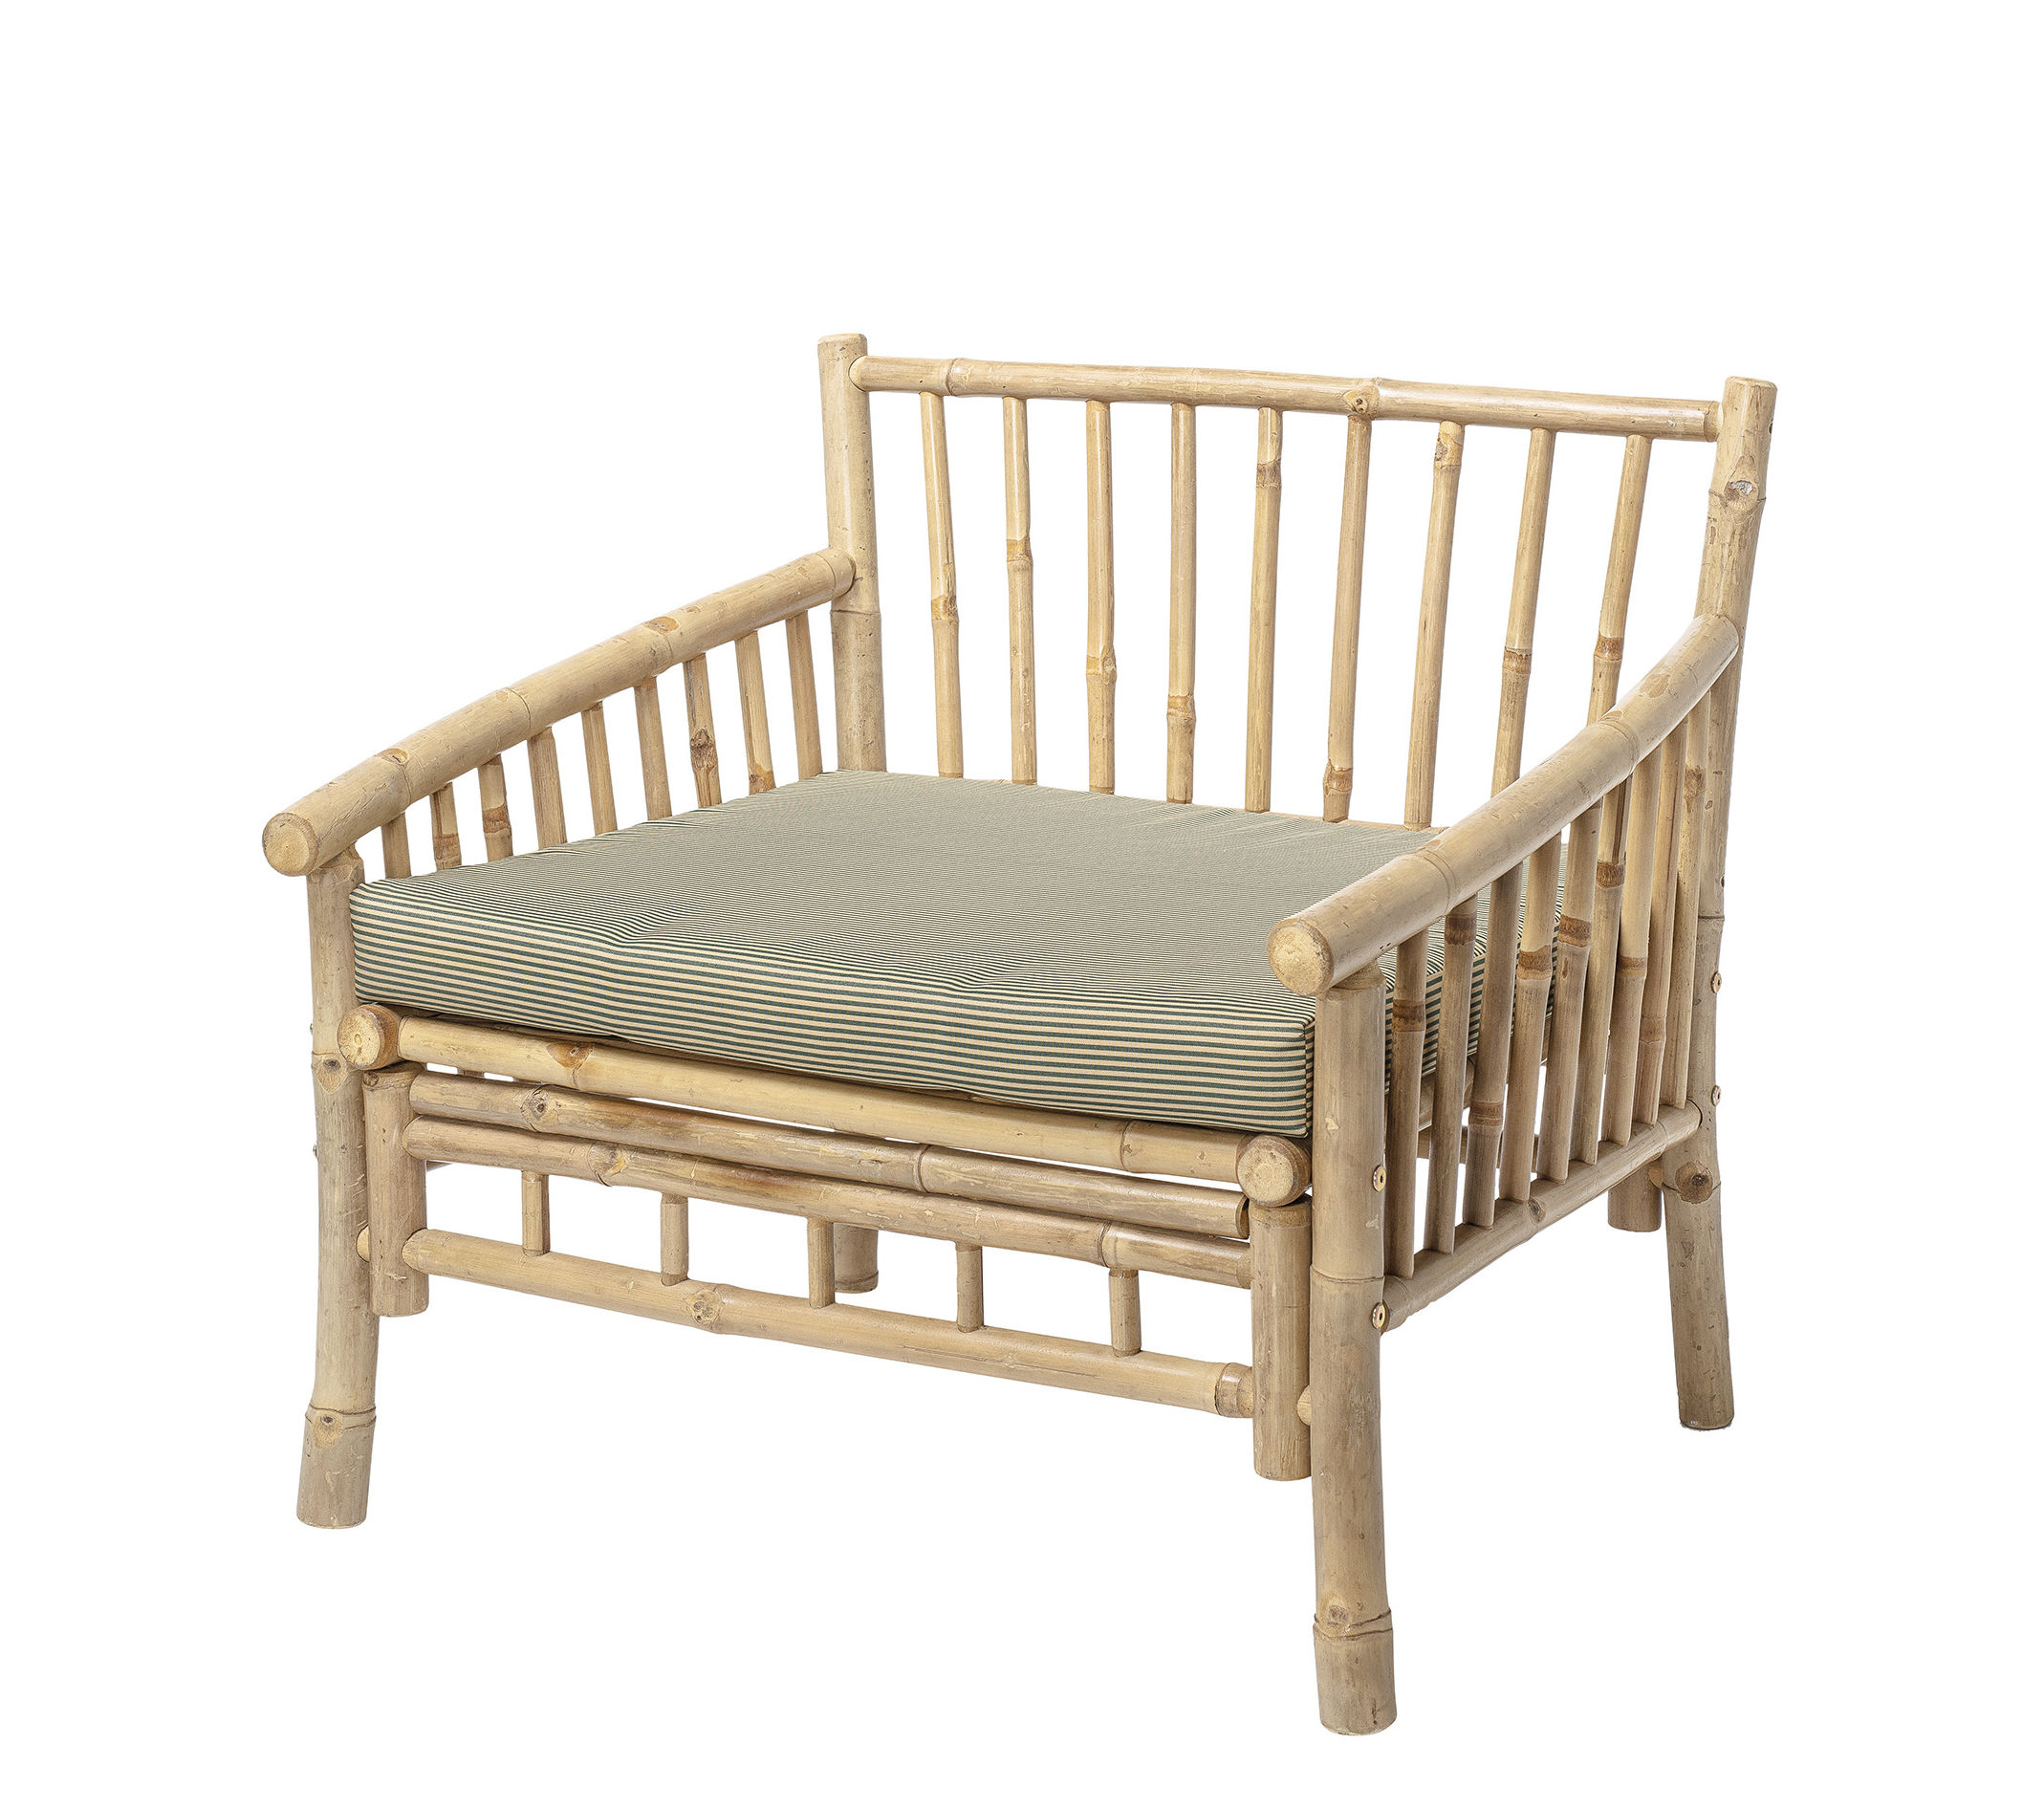 Möbel - Lounge Sessel - Sole Sessel / Bambus - Mit Kissen - Bloomingville - Bambus / Kissen beige gestreift - Bambus, Gewebe